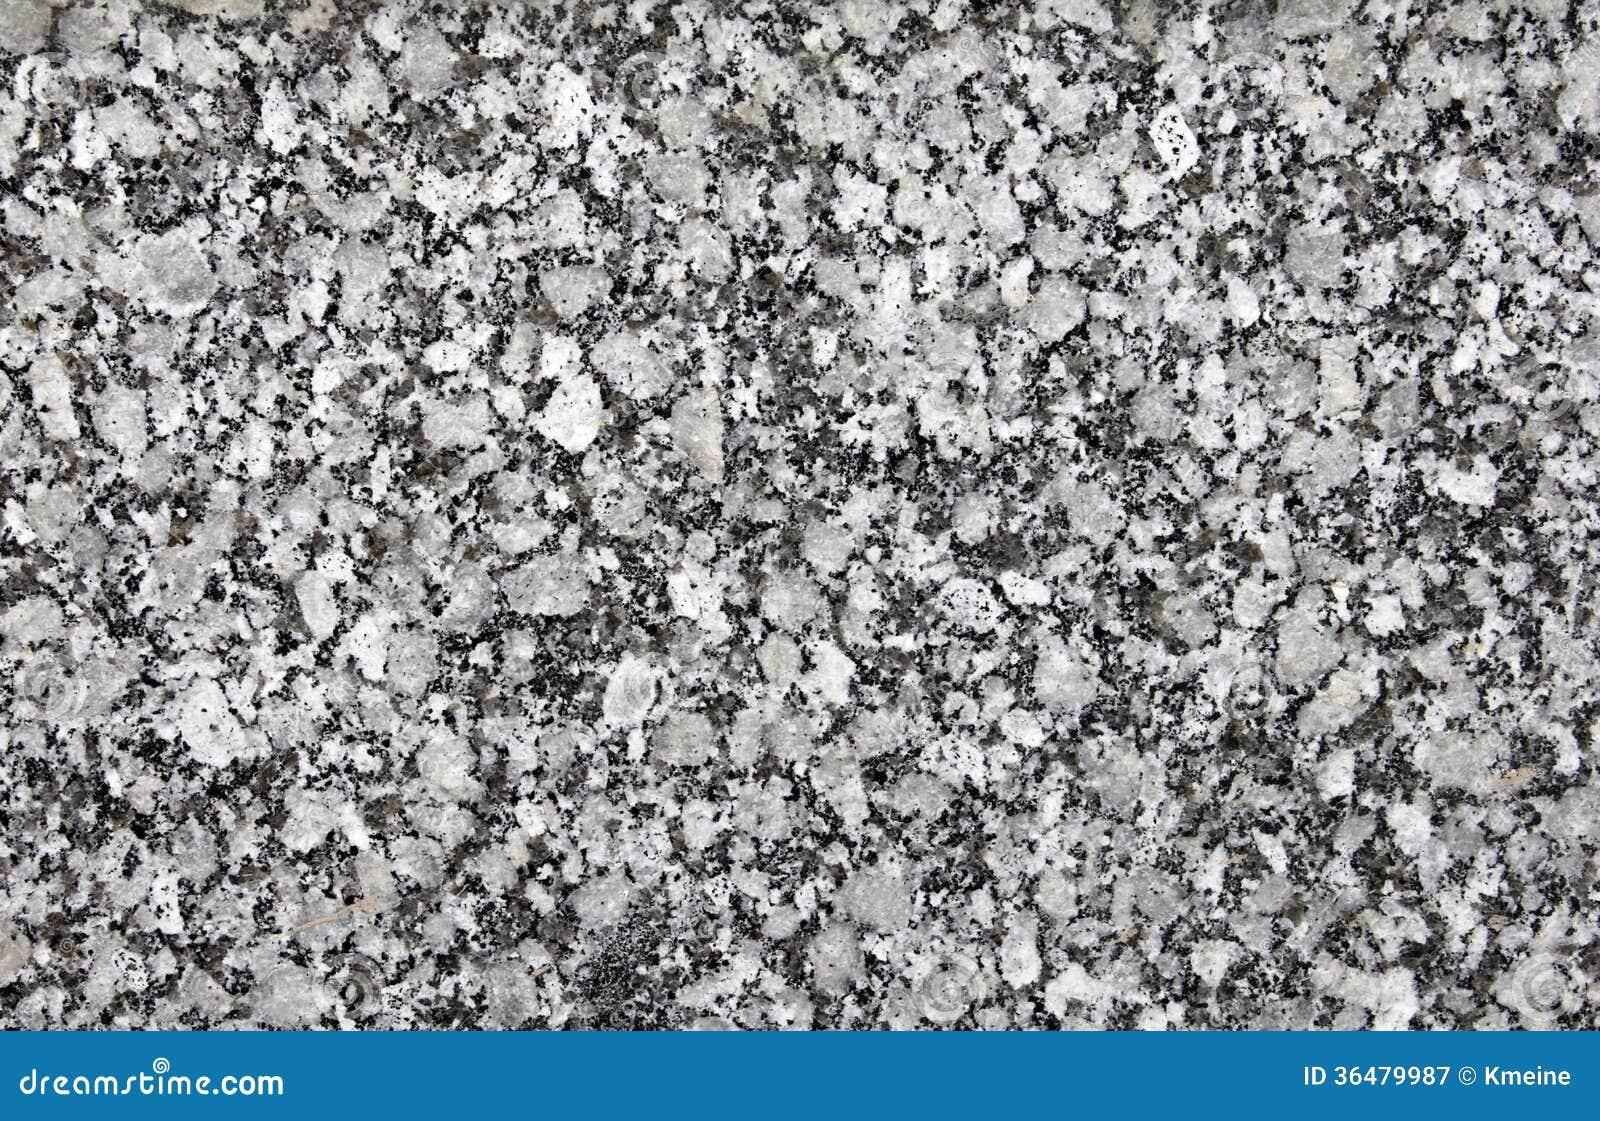 White Granite Background : Black and white granite background stock image